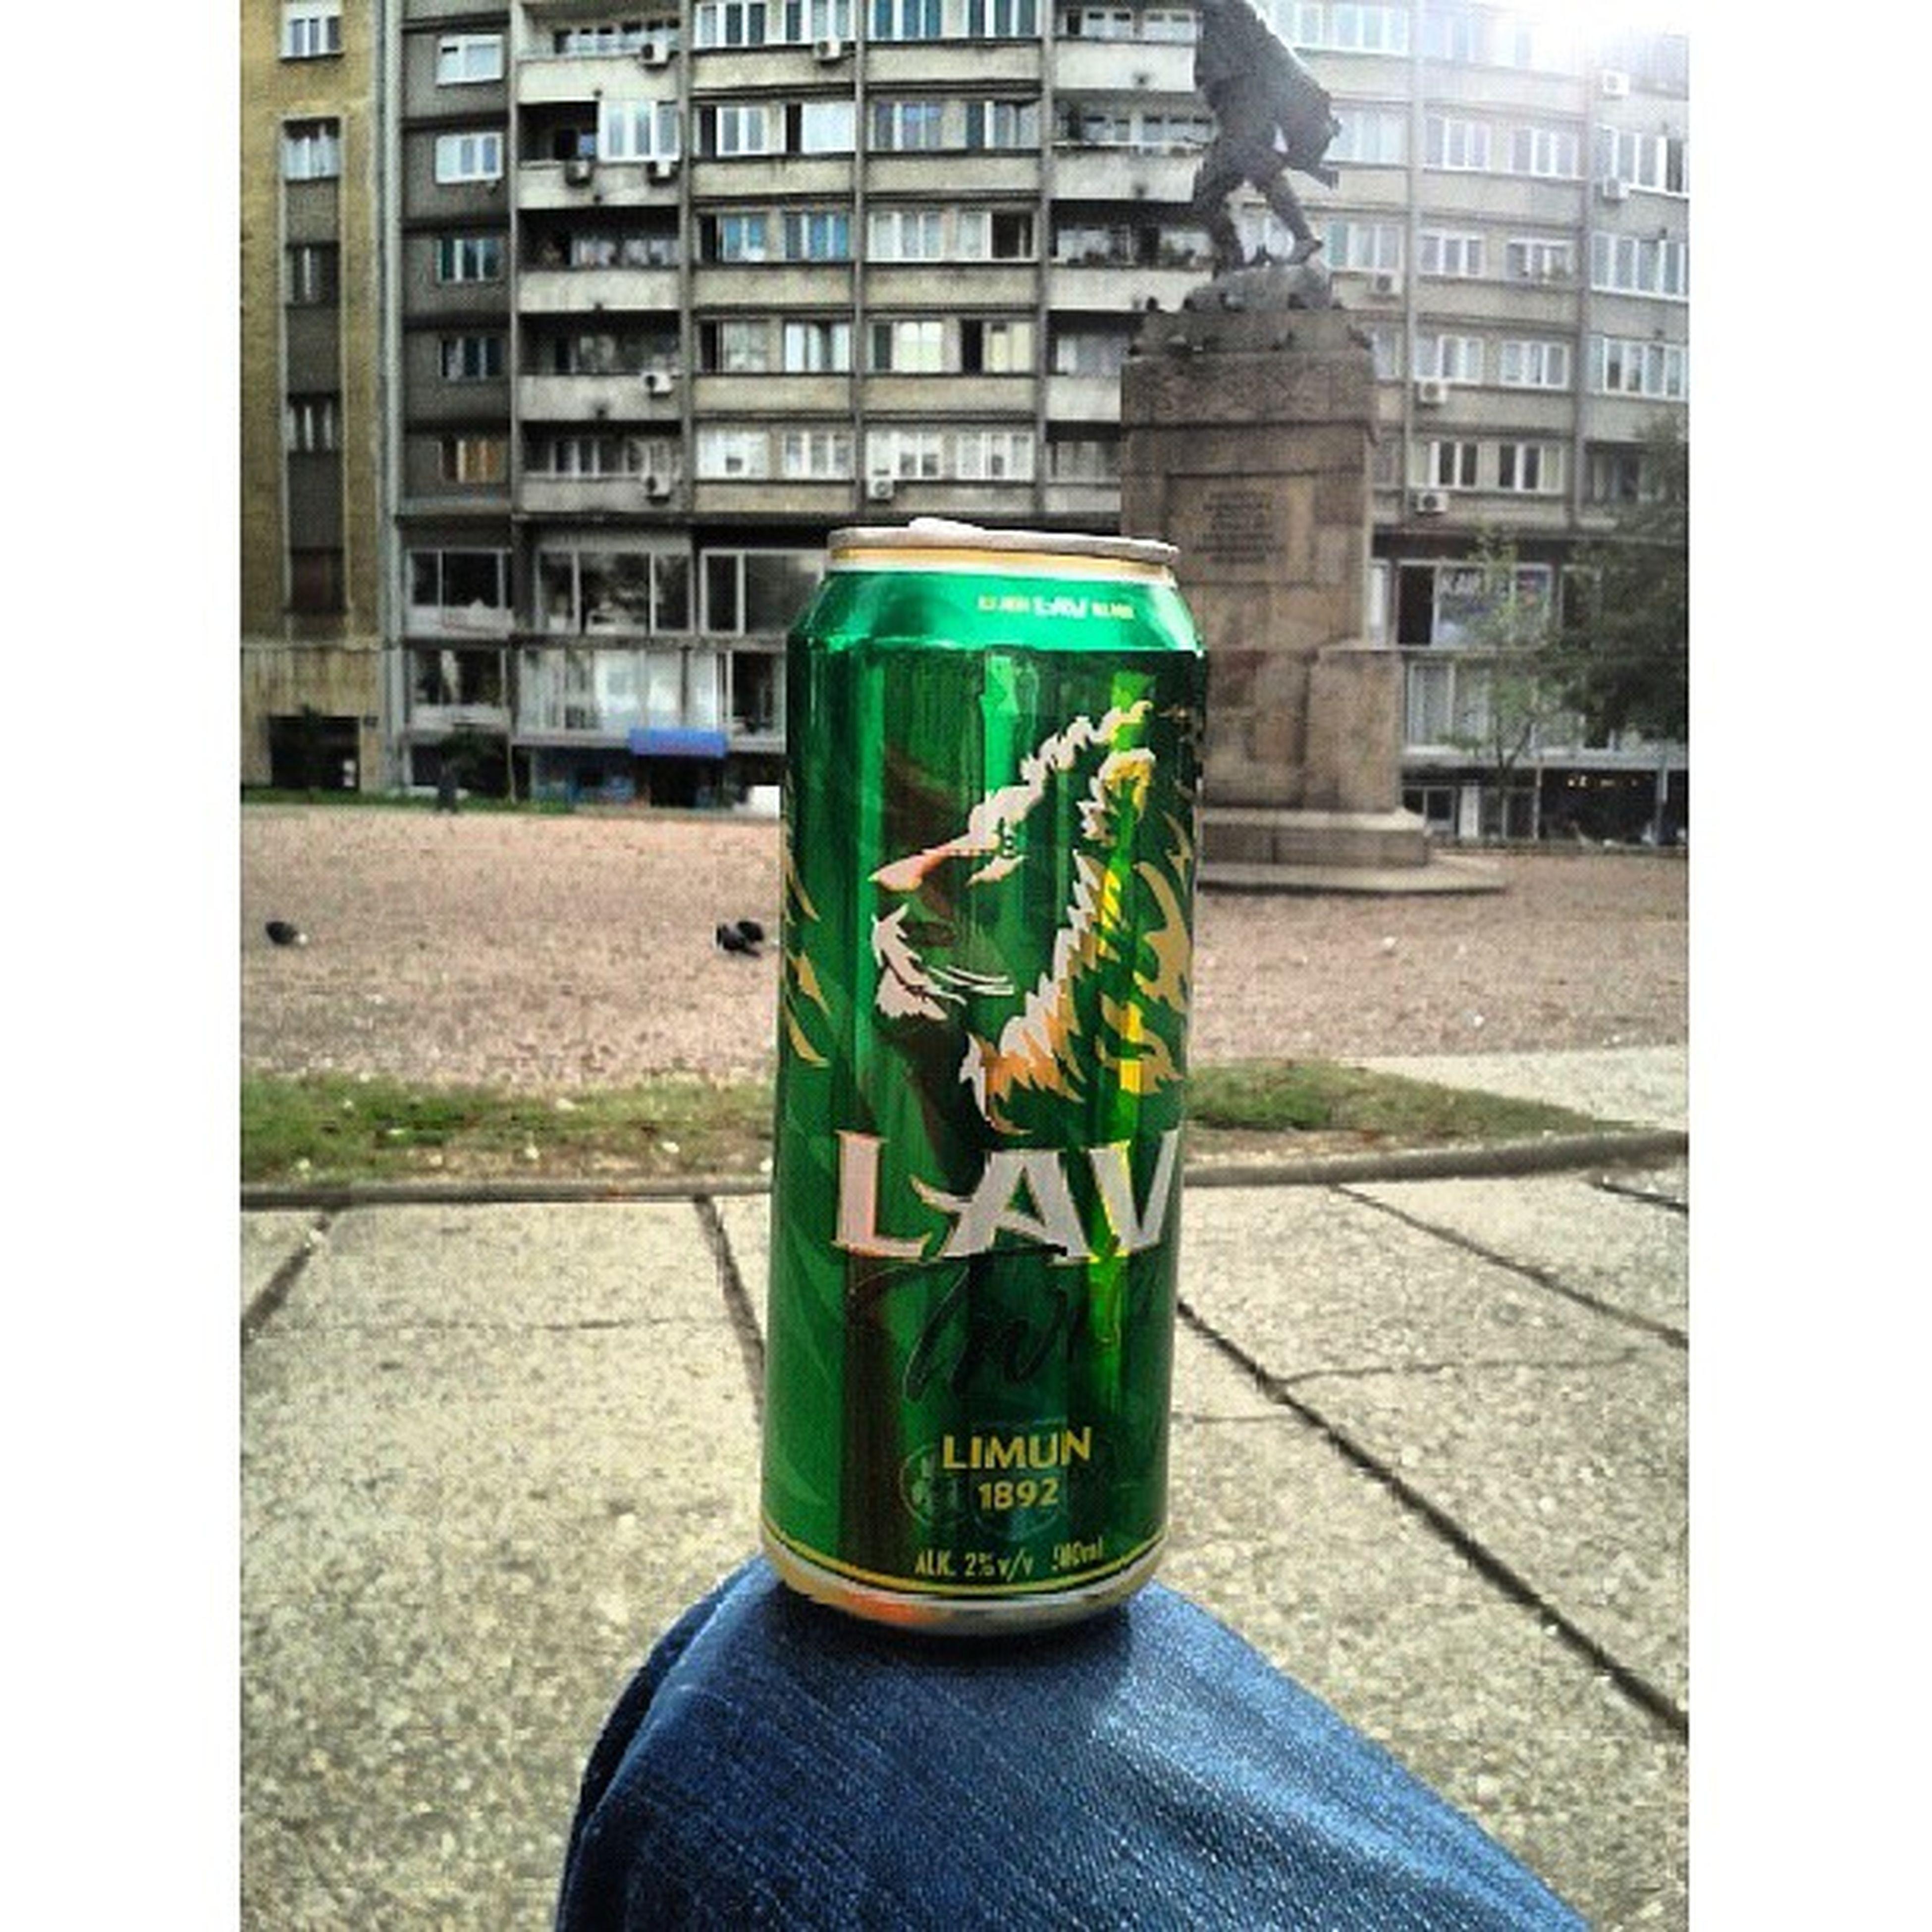 Lemon beer Lav Beer Beograd Park Public drink drunk